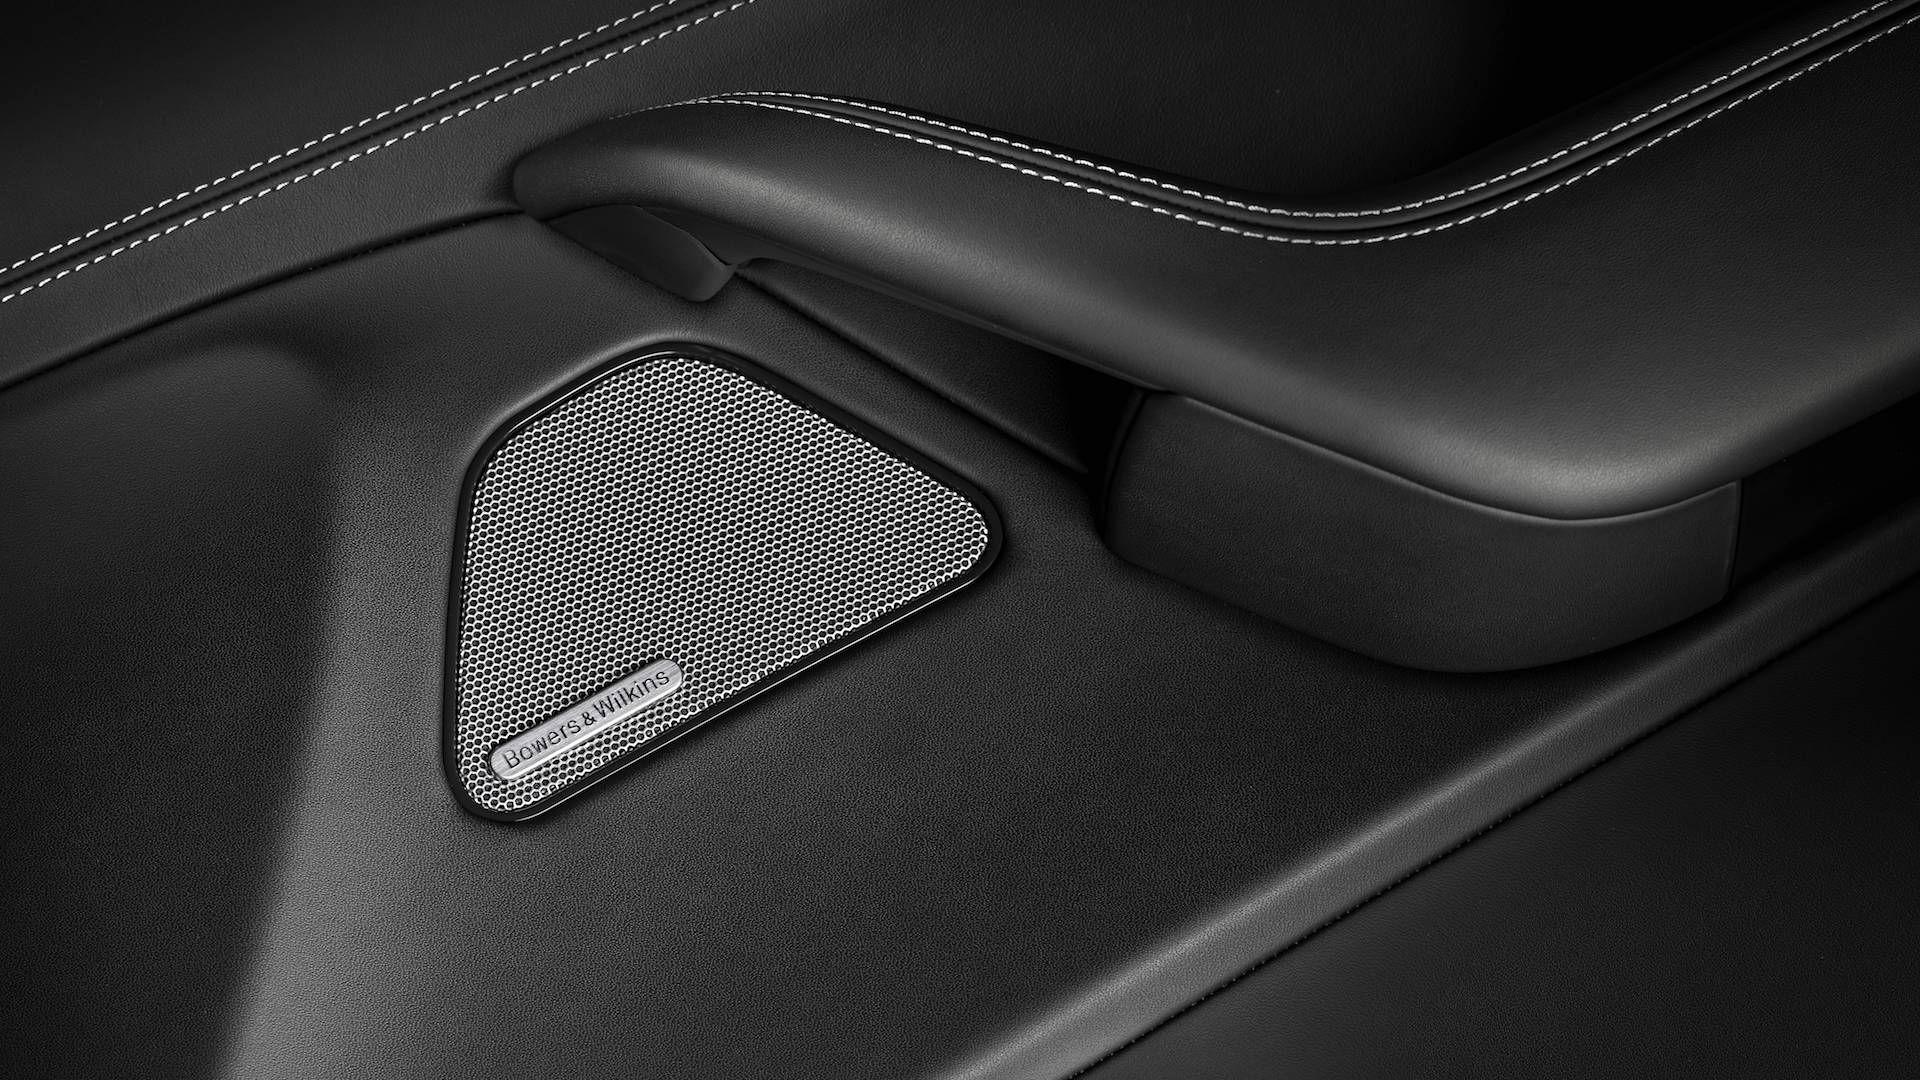 Maserati Levante: Bowers & Wilkins Surround Sound system detail